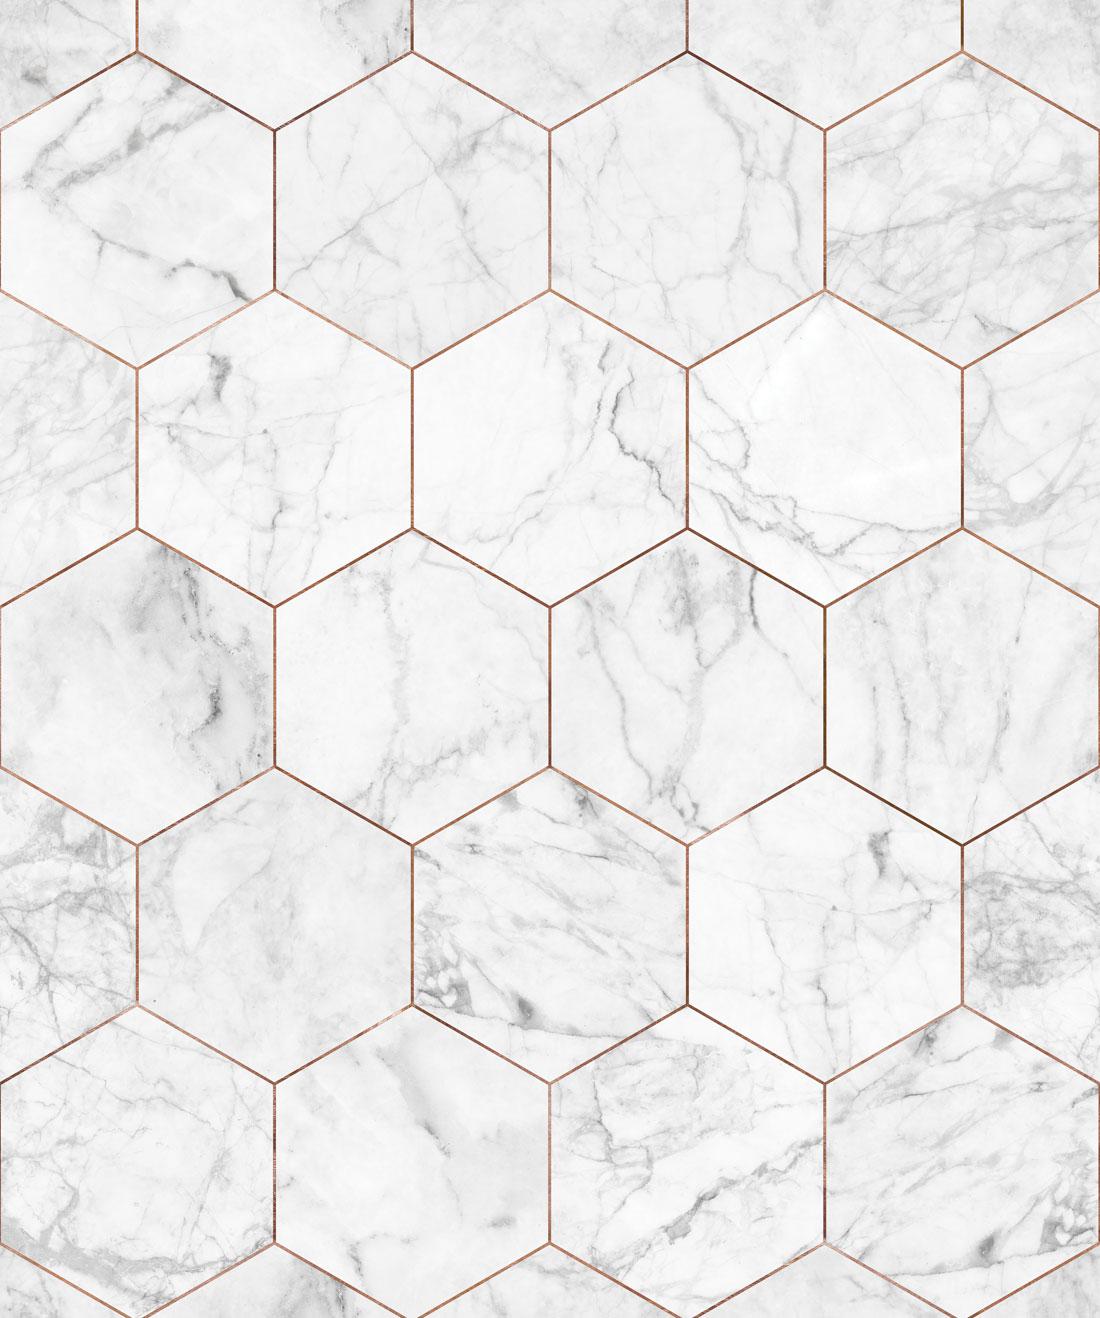 Marble Copper Tiles Wallpaper Crisp Marble Tiles Milton King 1100x1318